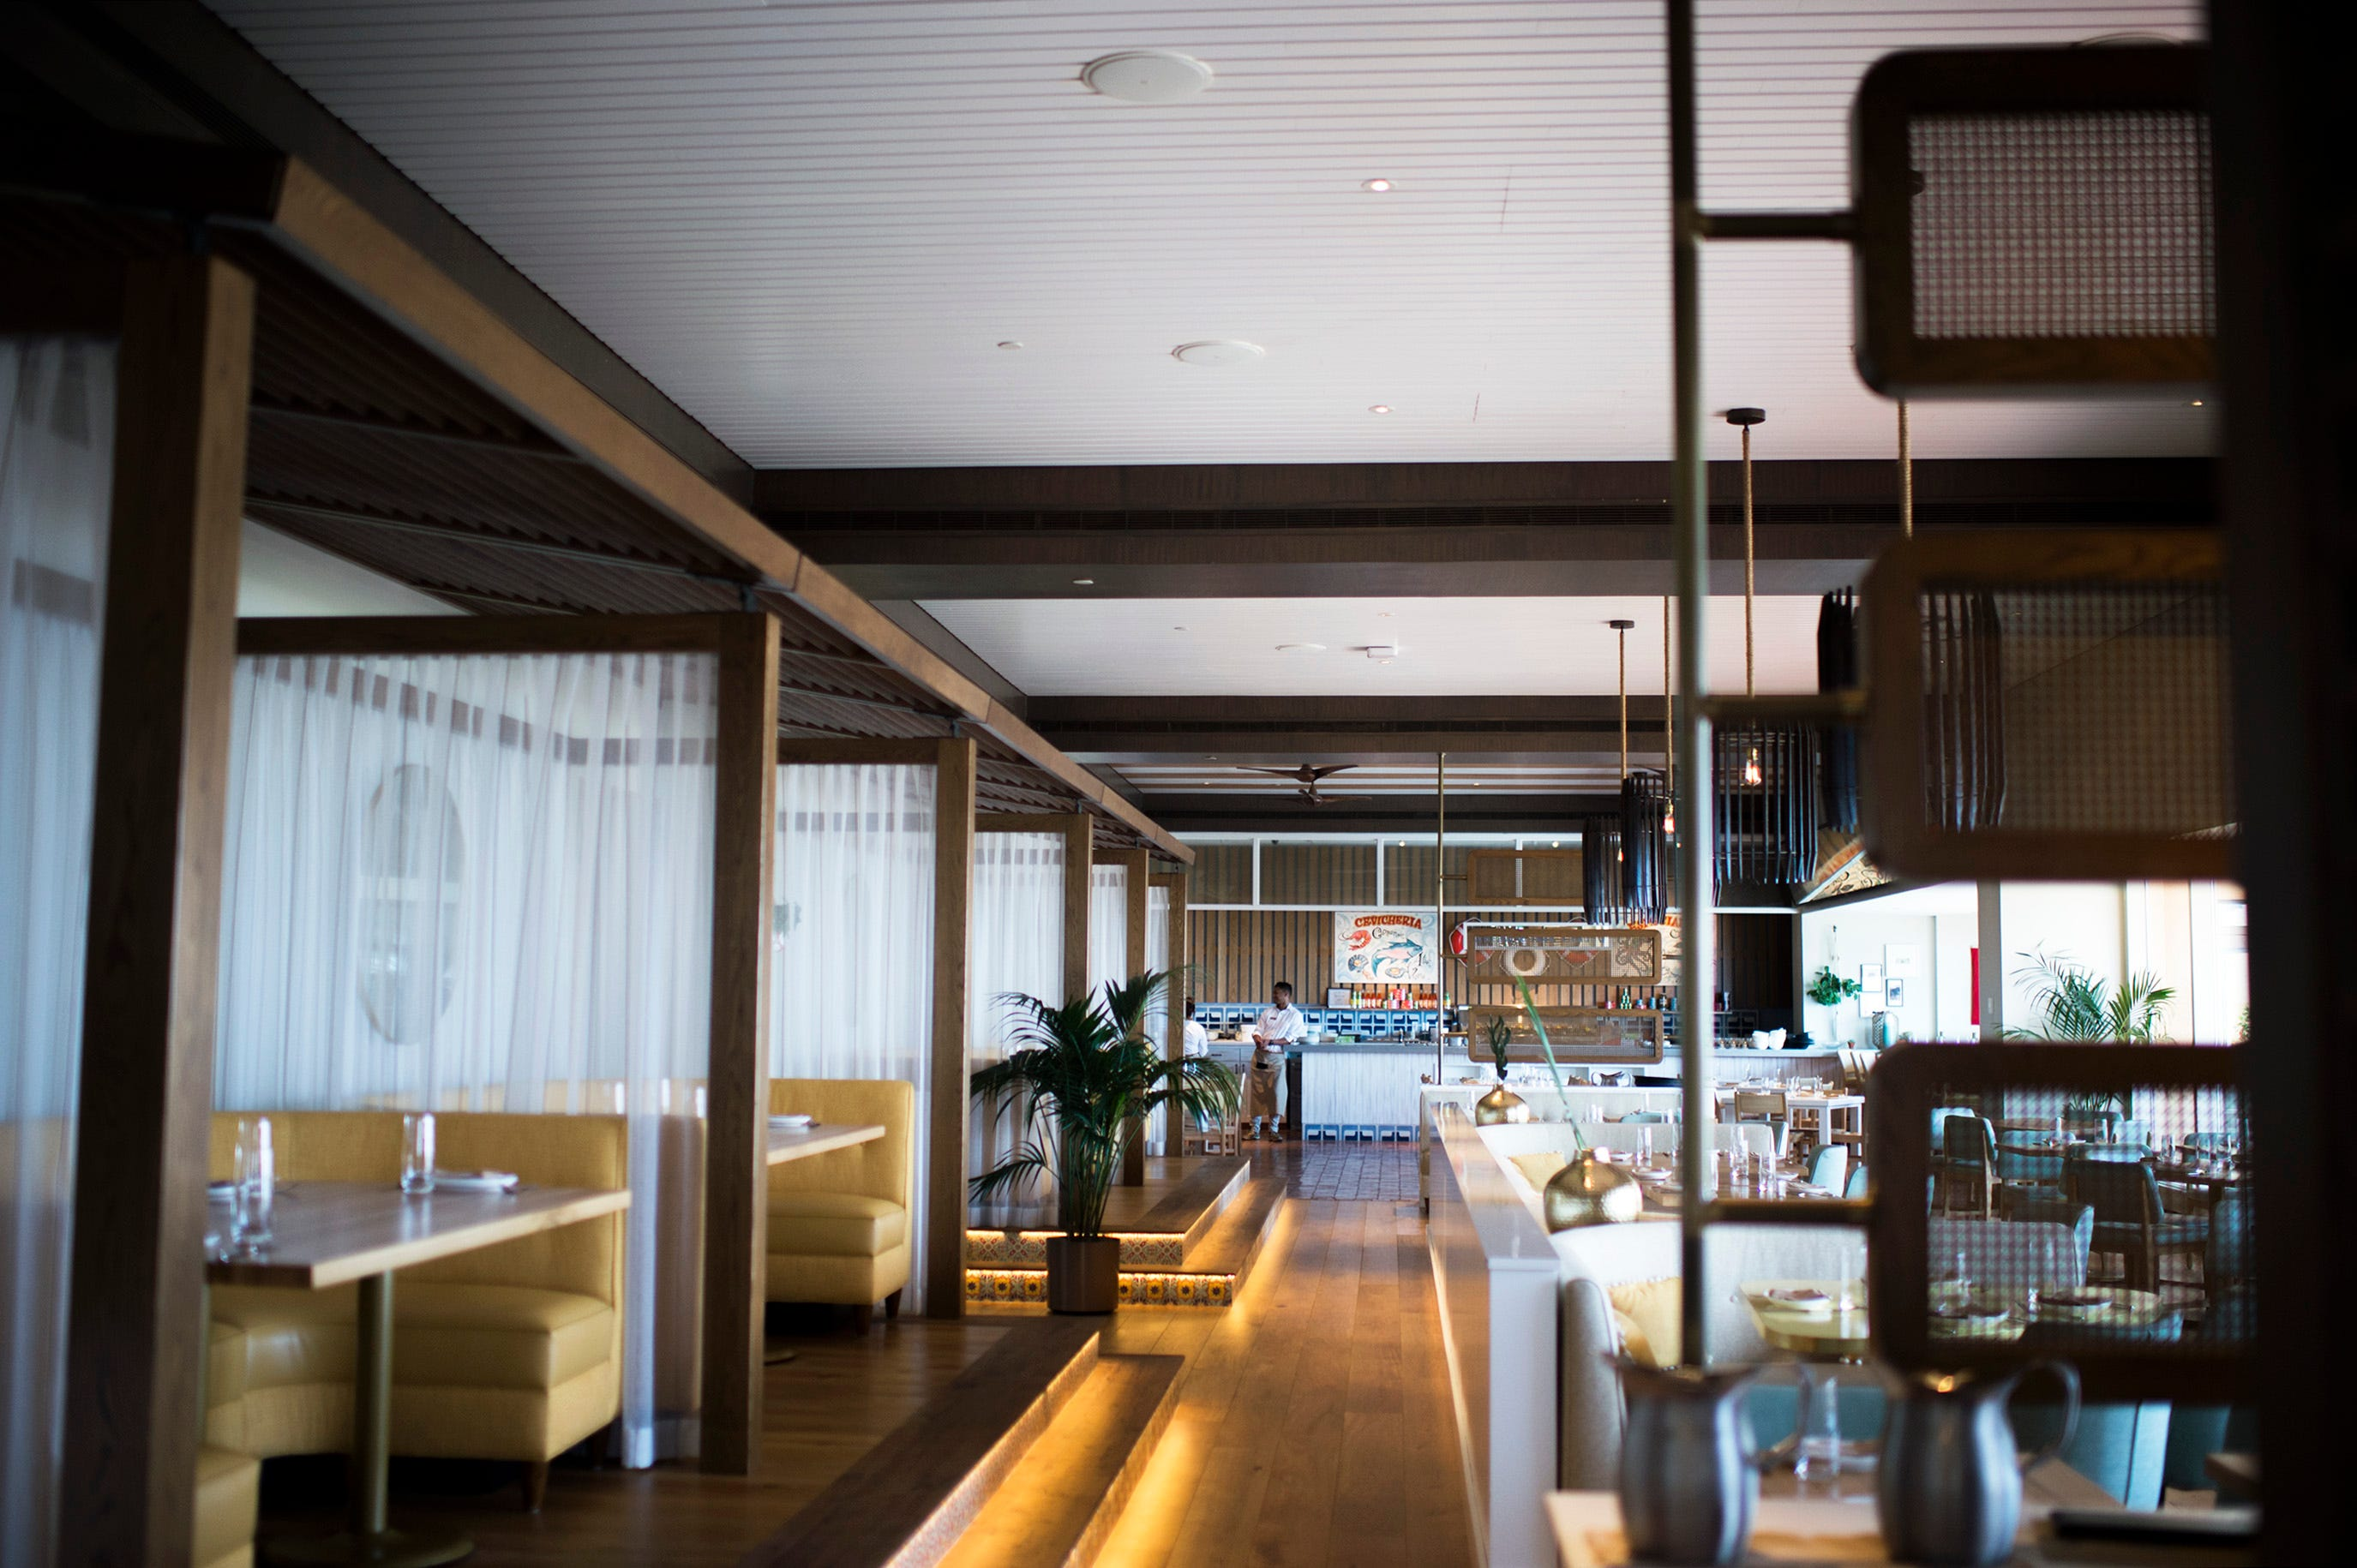 kreative moderne wohnung interieur donovan hill, http://www.courierpostonline/picture-gallery/entertainment/2018, Design ideen